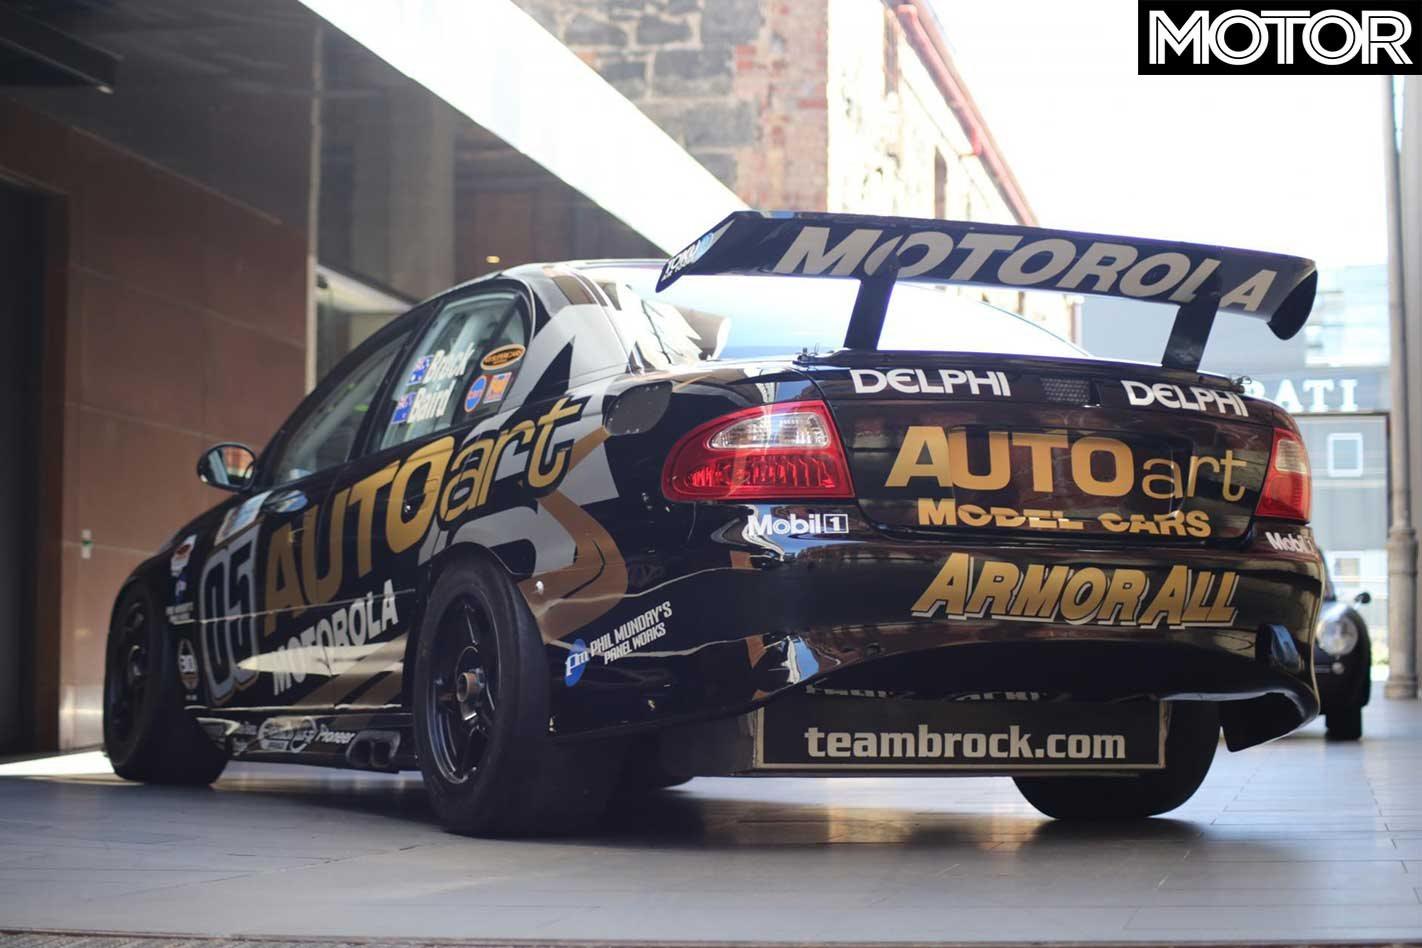 Peter Brock's Bathurst 1000 Holden VX Commodore Supercar for